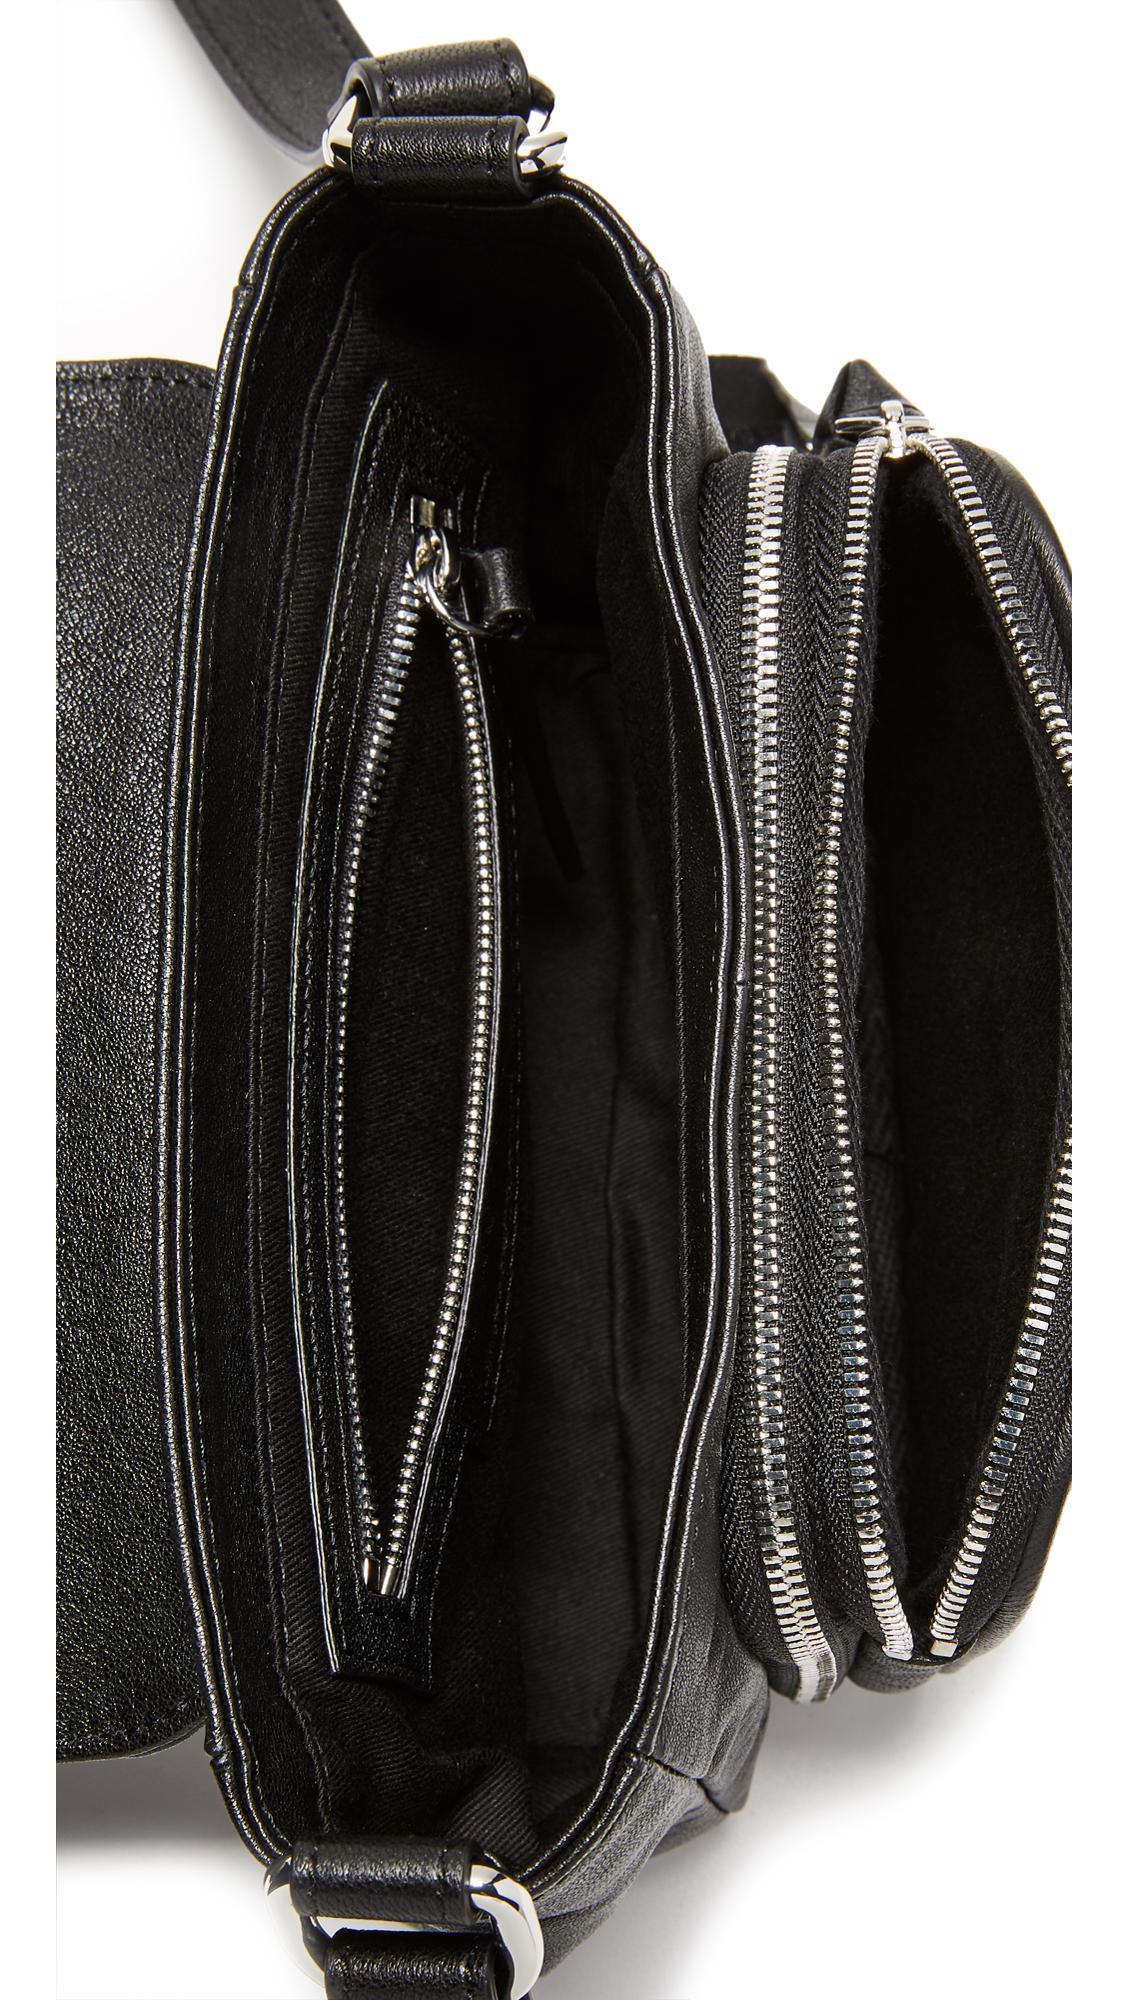 McQ Leather Biker Cross Body Bag in Black